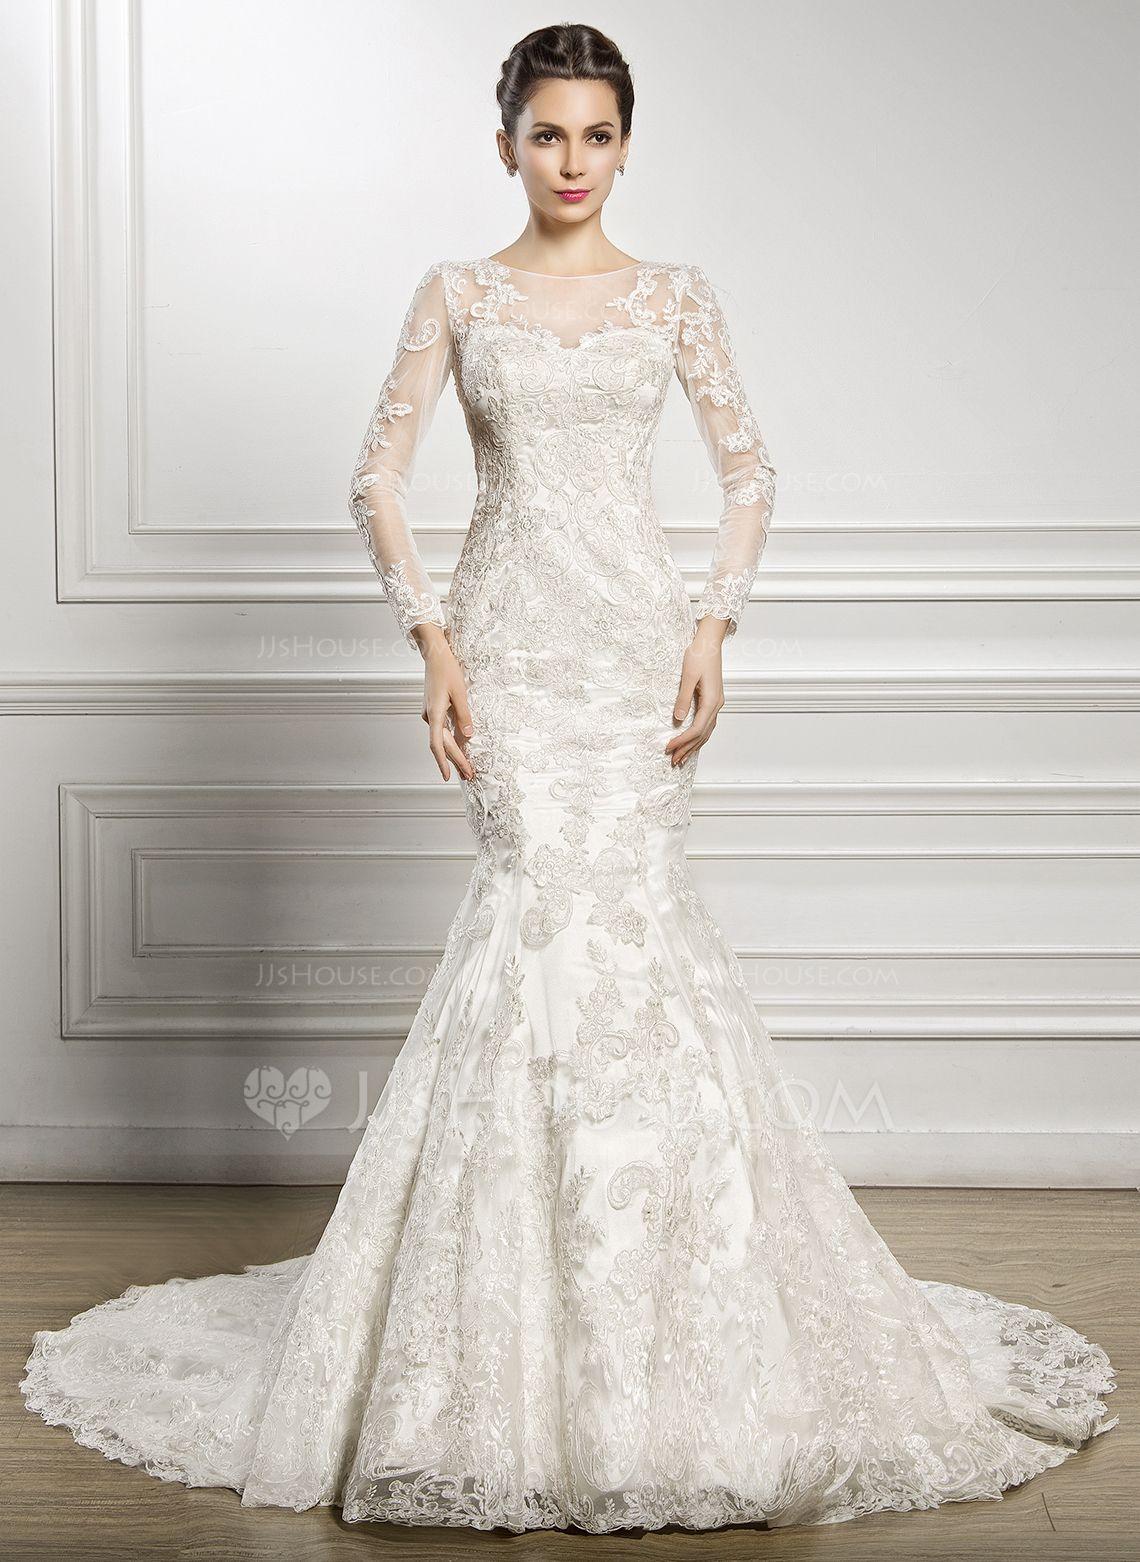 Us 427 00 Trumpet Mermaid Illusion Chapel Train Lace Wedding Dress With Beading Sequins Jj S House Wedding Dresses Under 100 Wedding Dresses Online Wedding Dress [ 1562 x 1140 Pixel ]